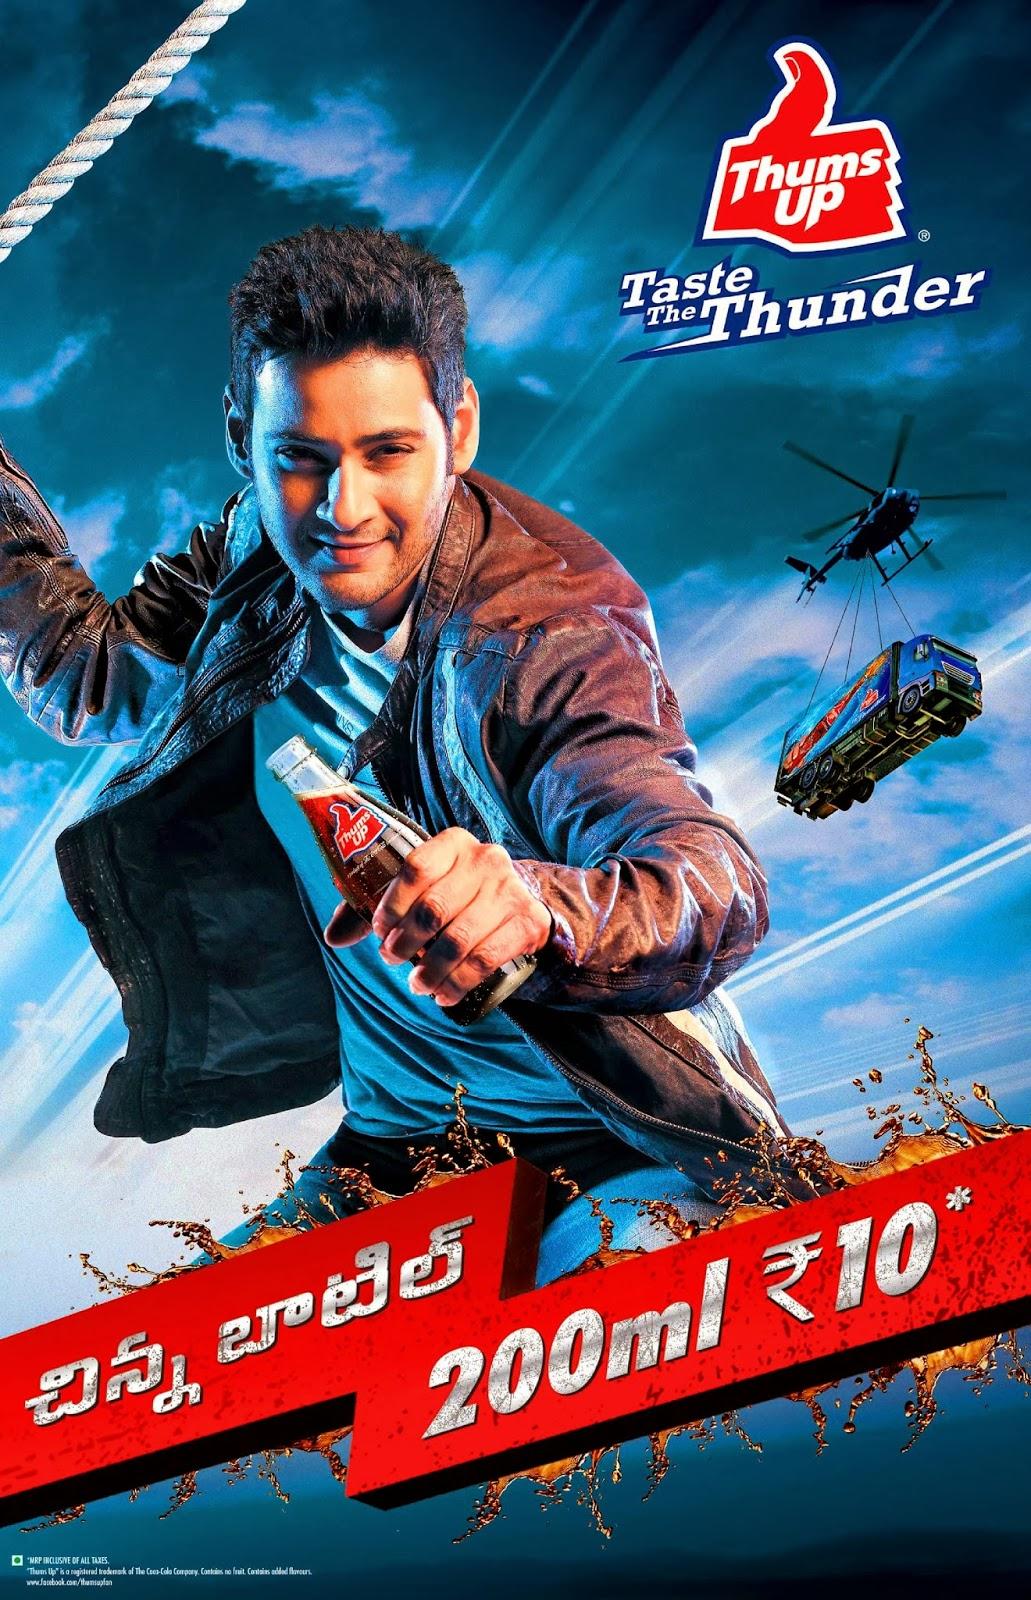 Mahesh Thumbs Up HD Poster - Cinema65.com